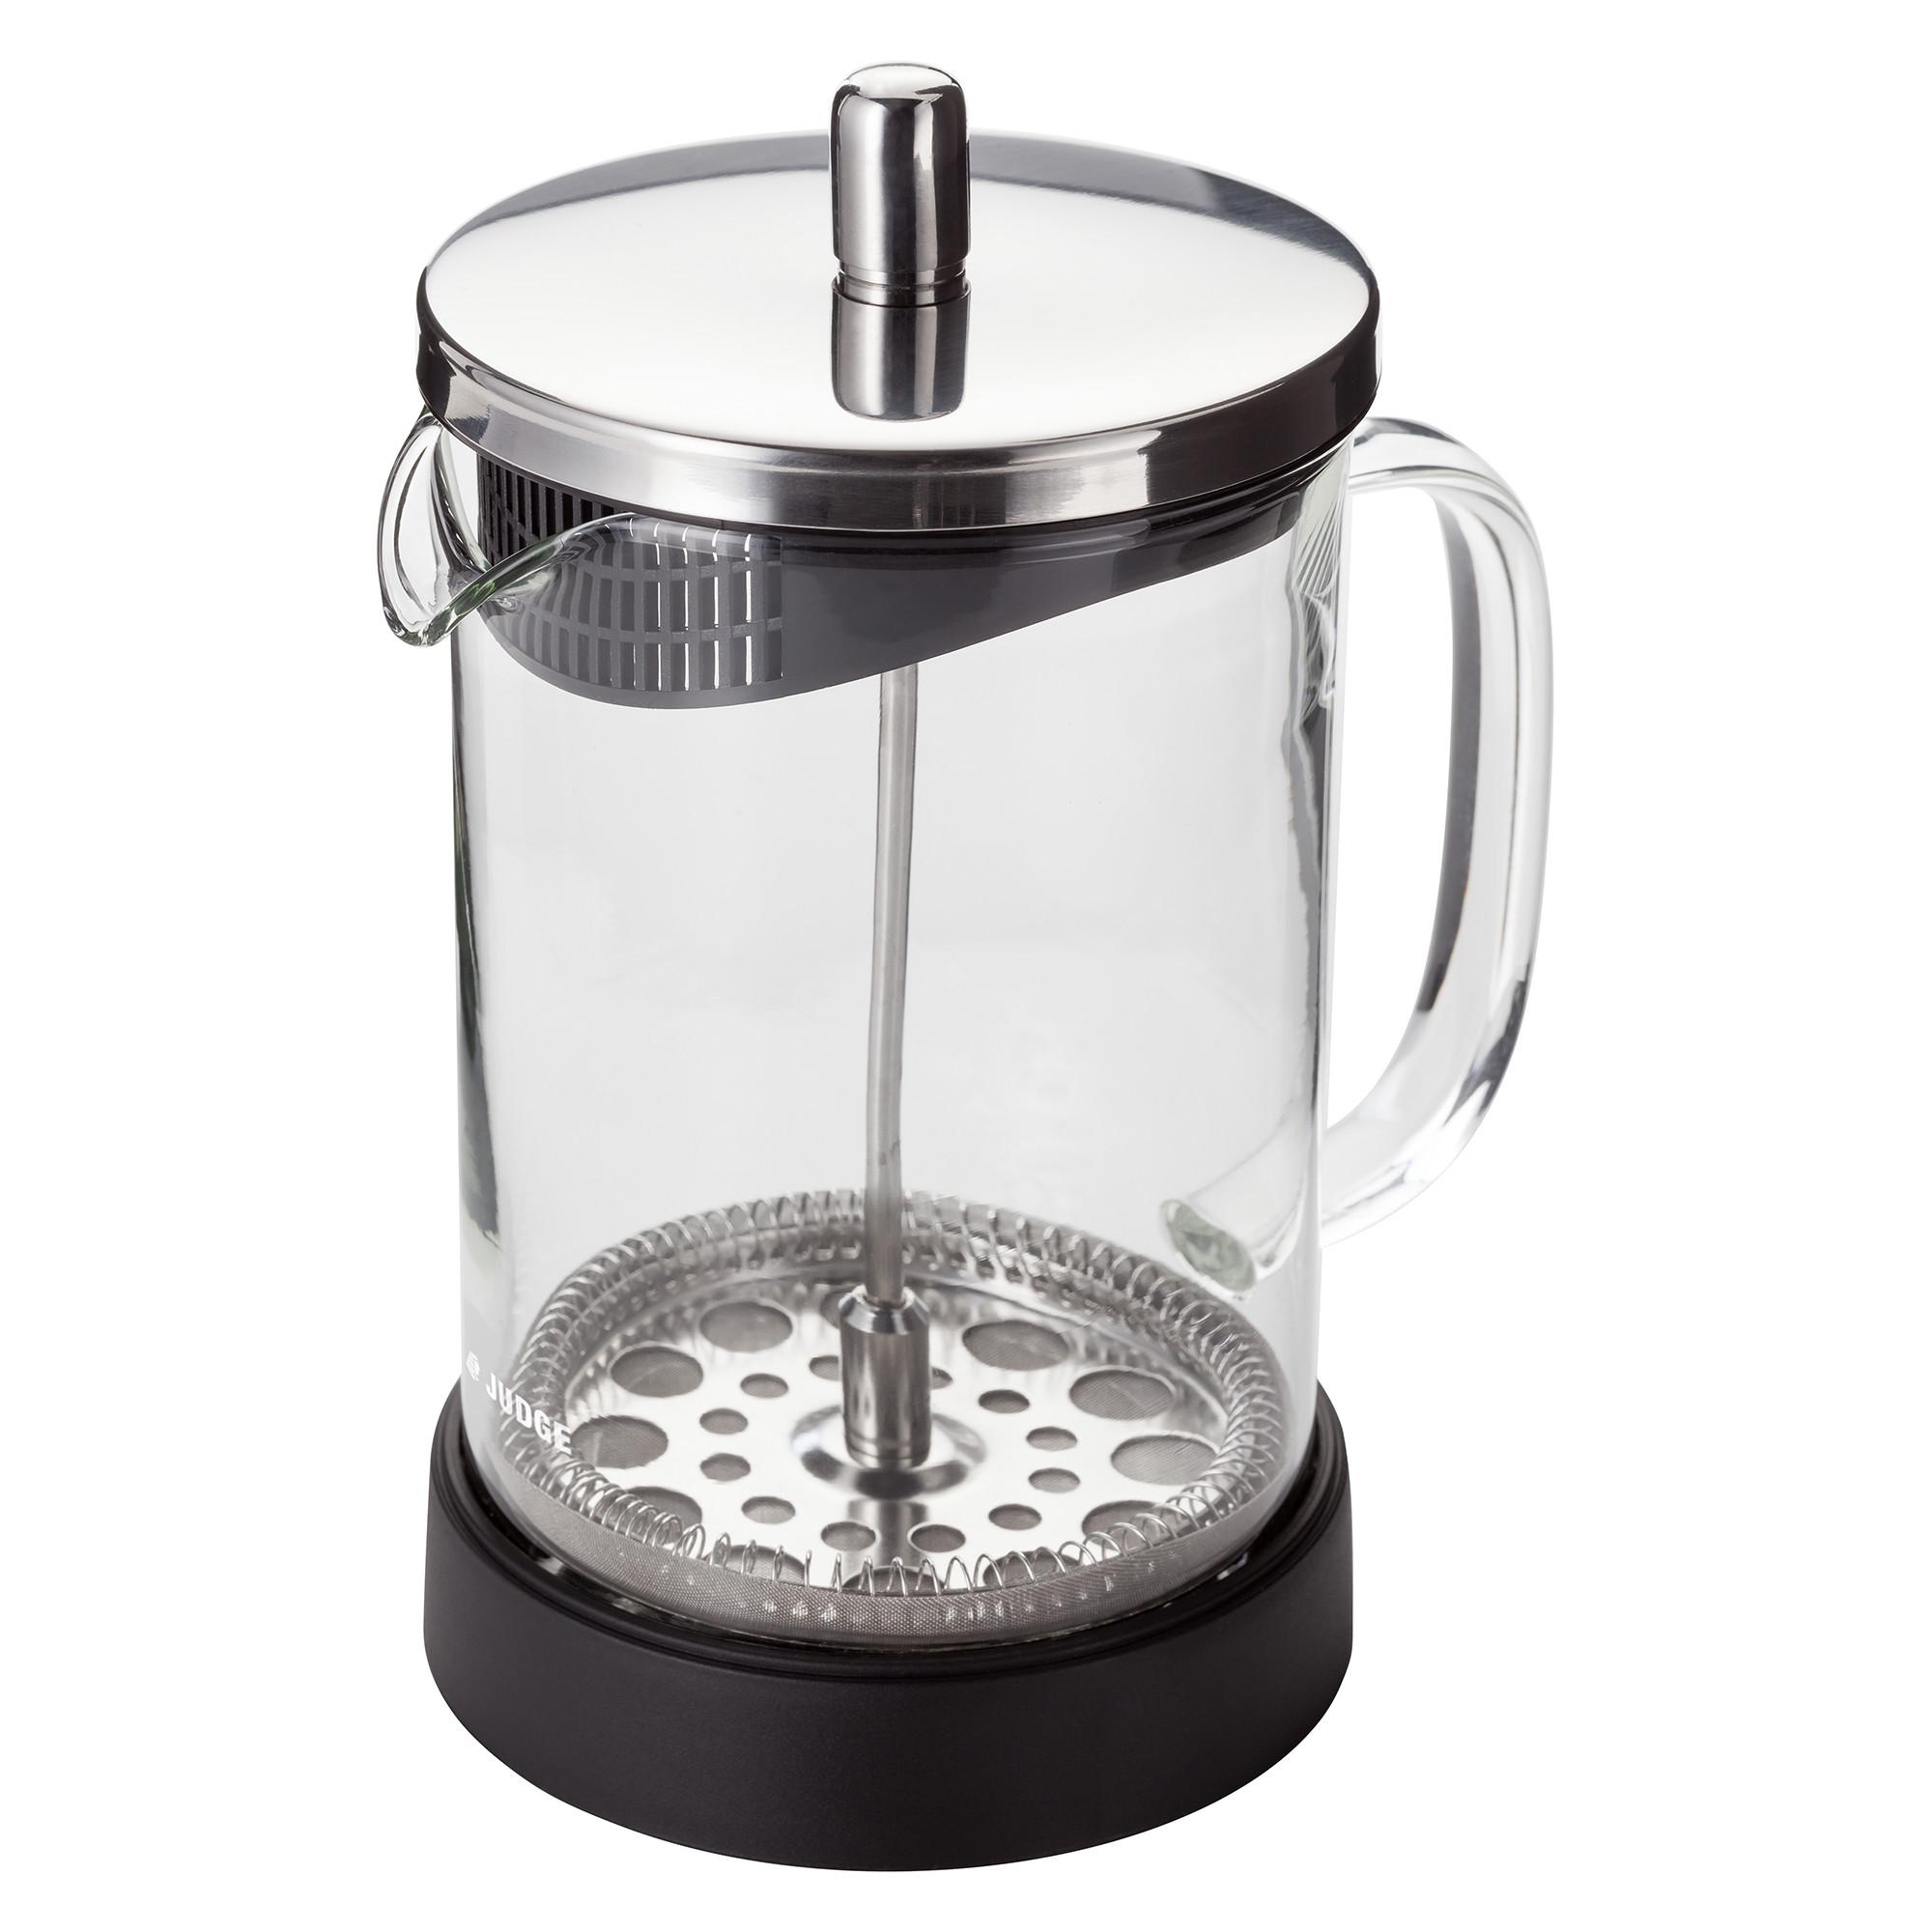 Cafetiere stempelkande, glas - 6 kopper